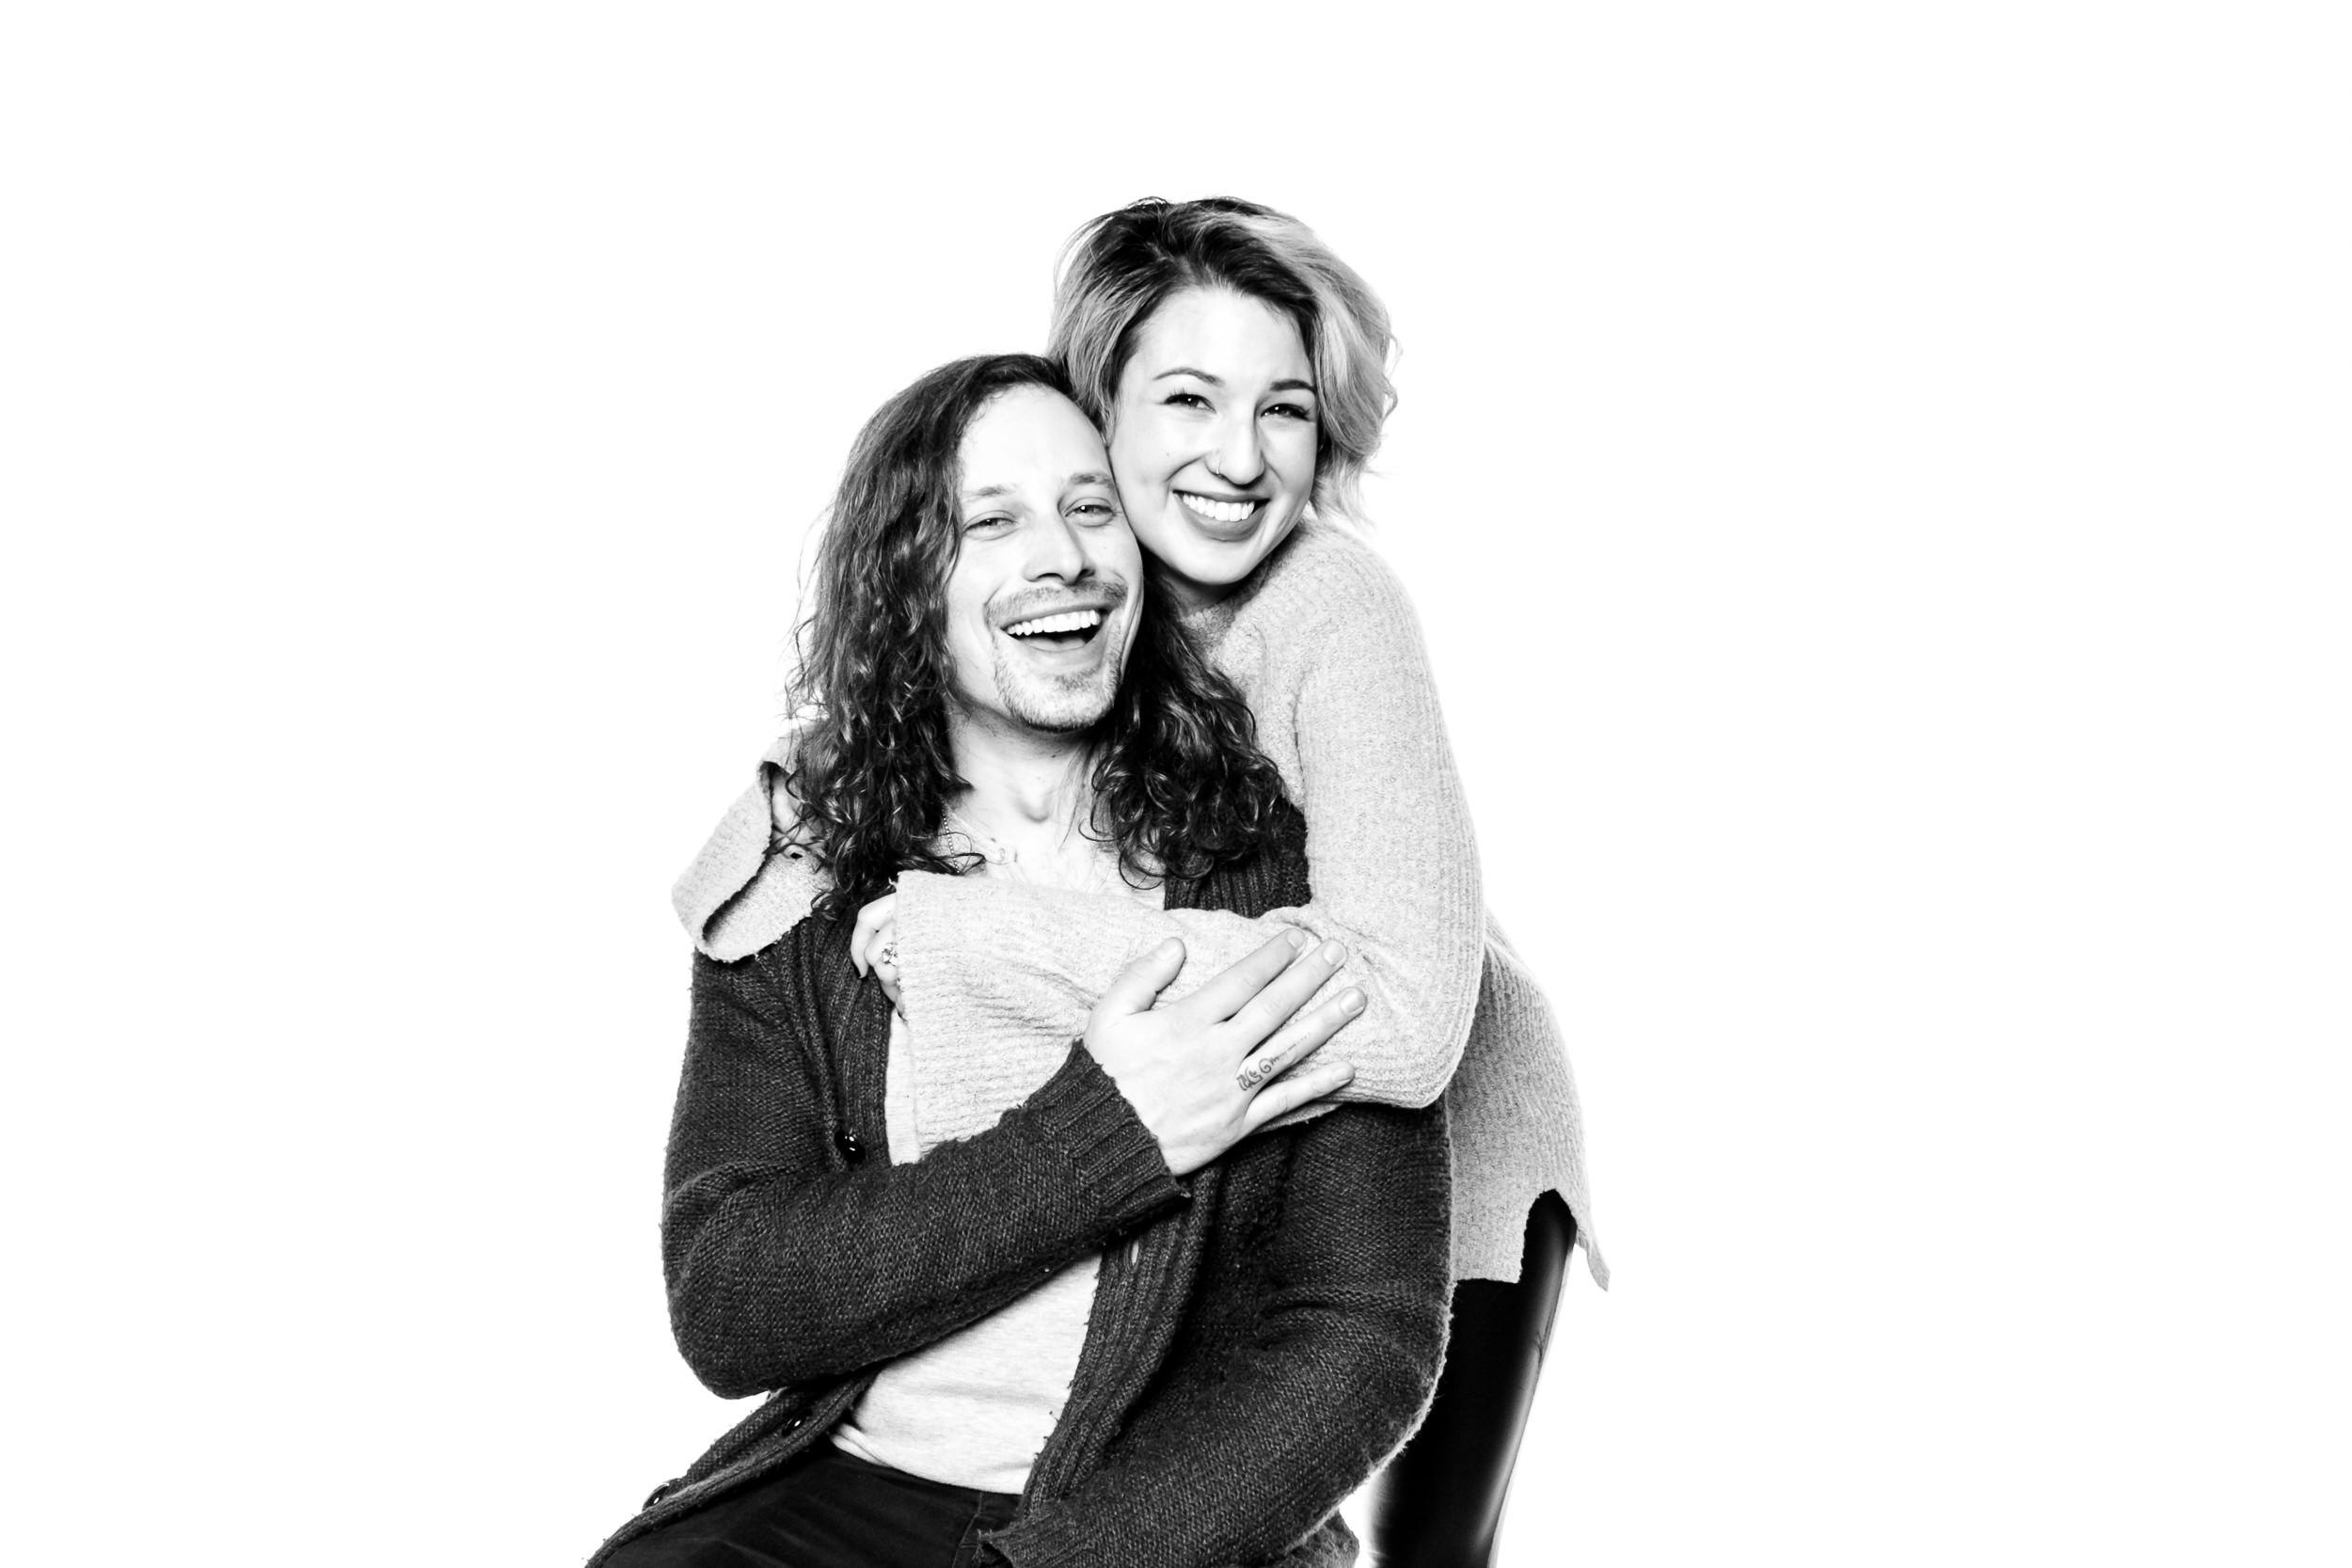 calgary black and white photo booth-21.jpg